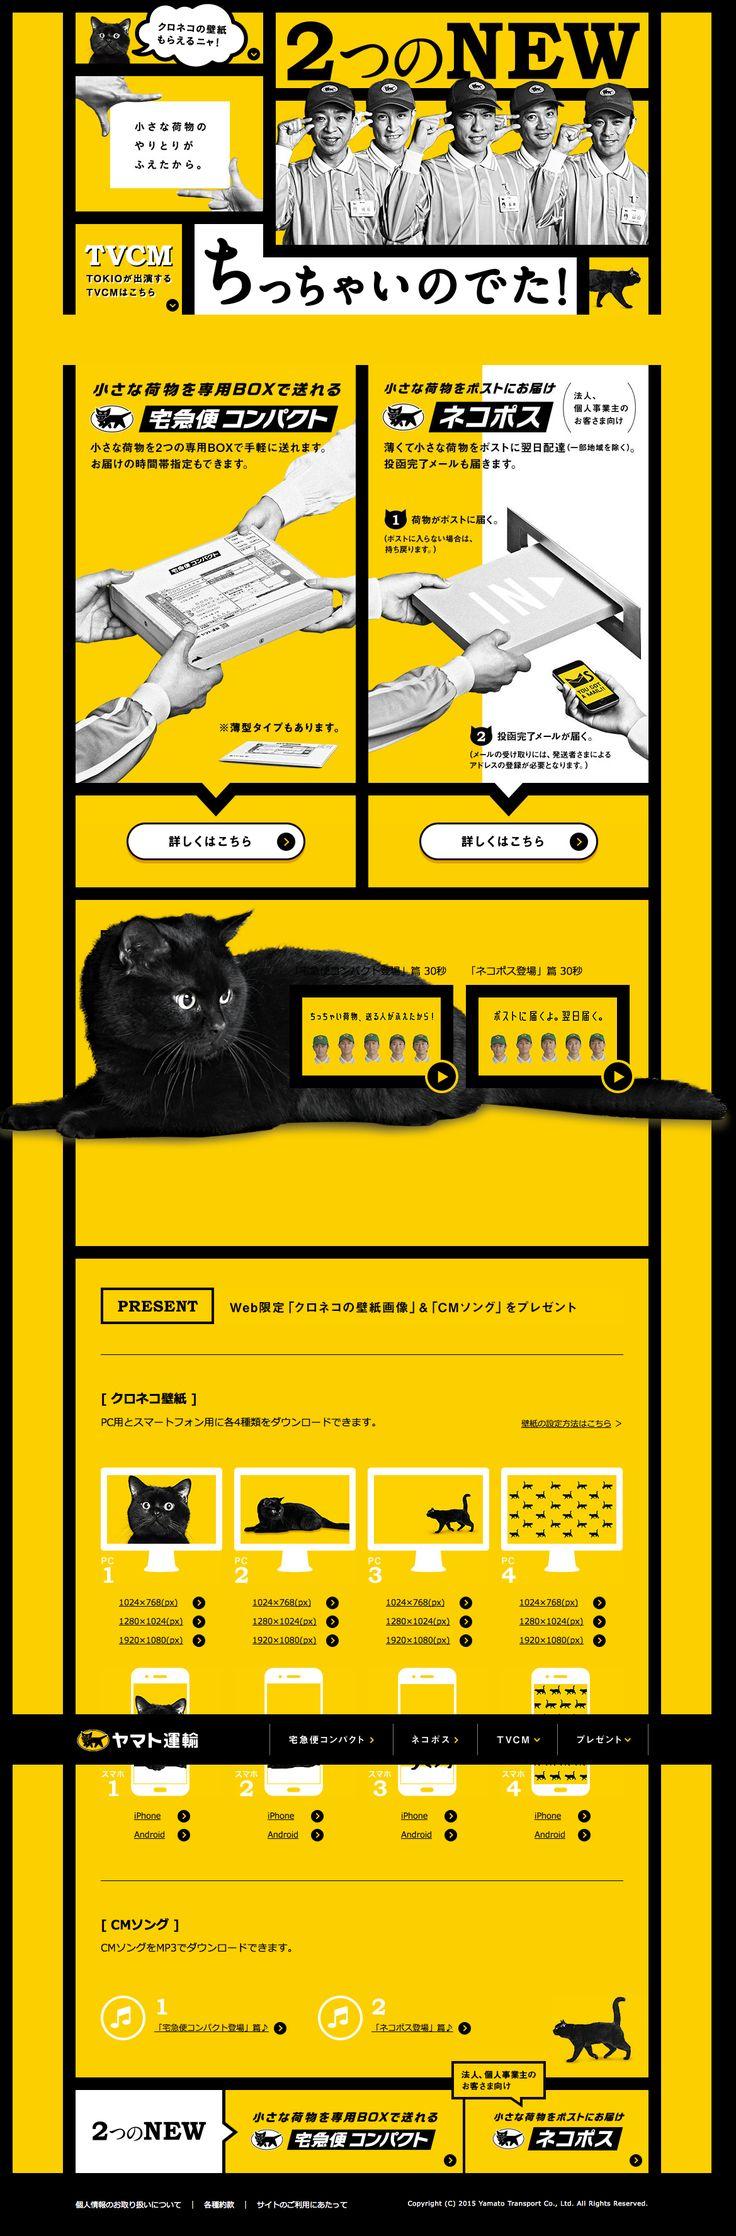 Yamato Transport. Quirky yet easy to identify. #webdesign